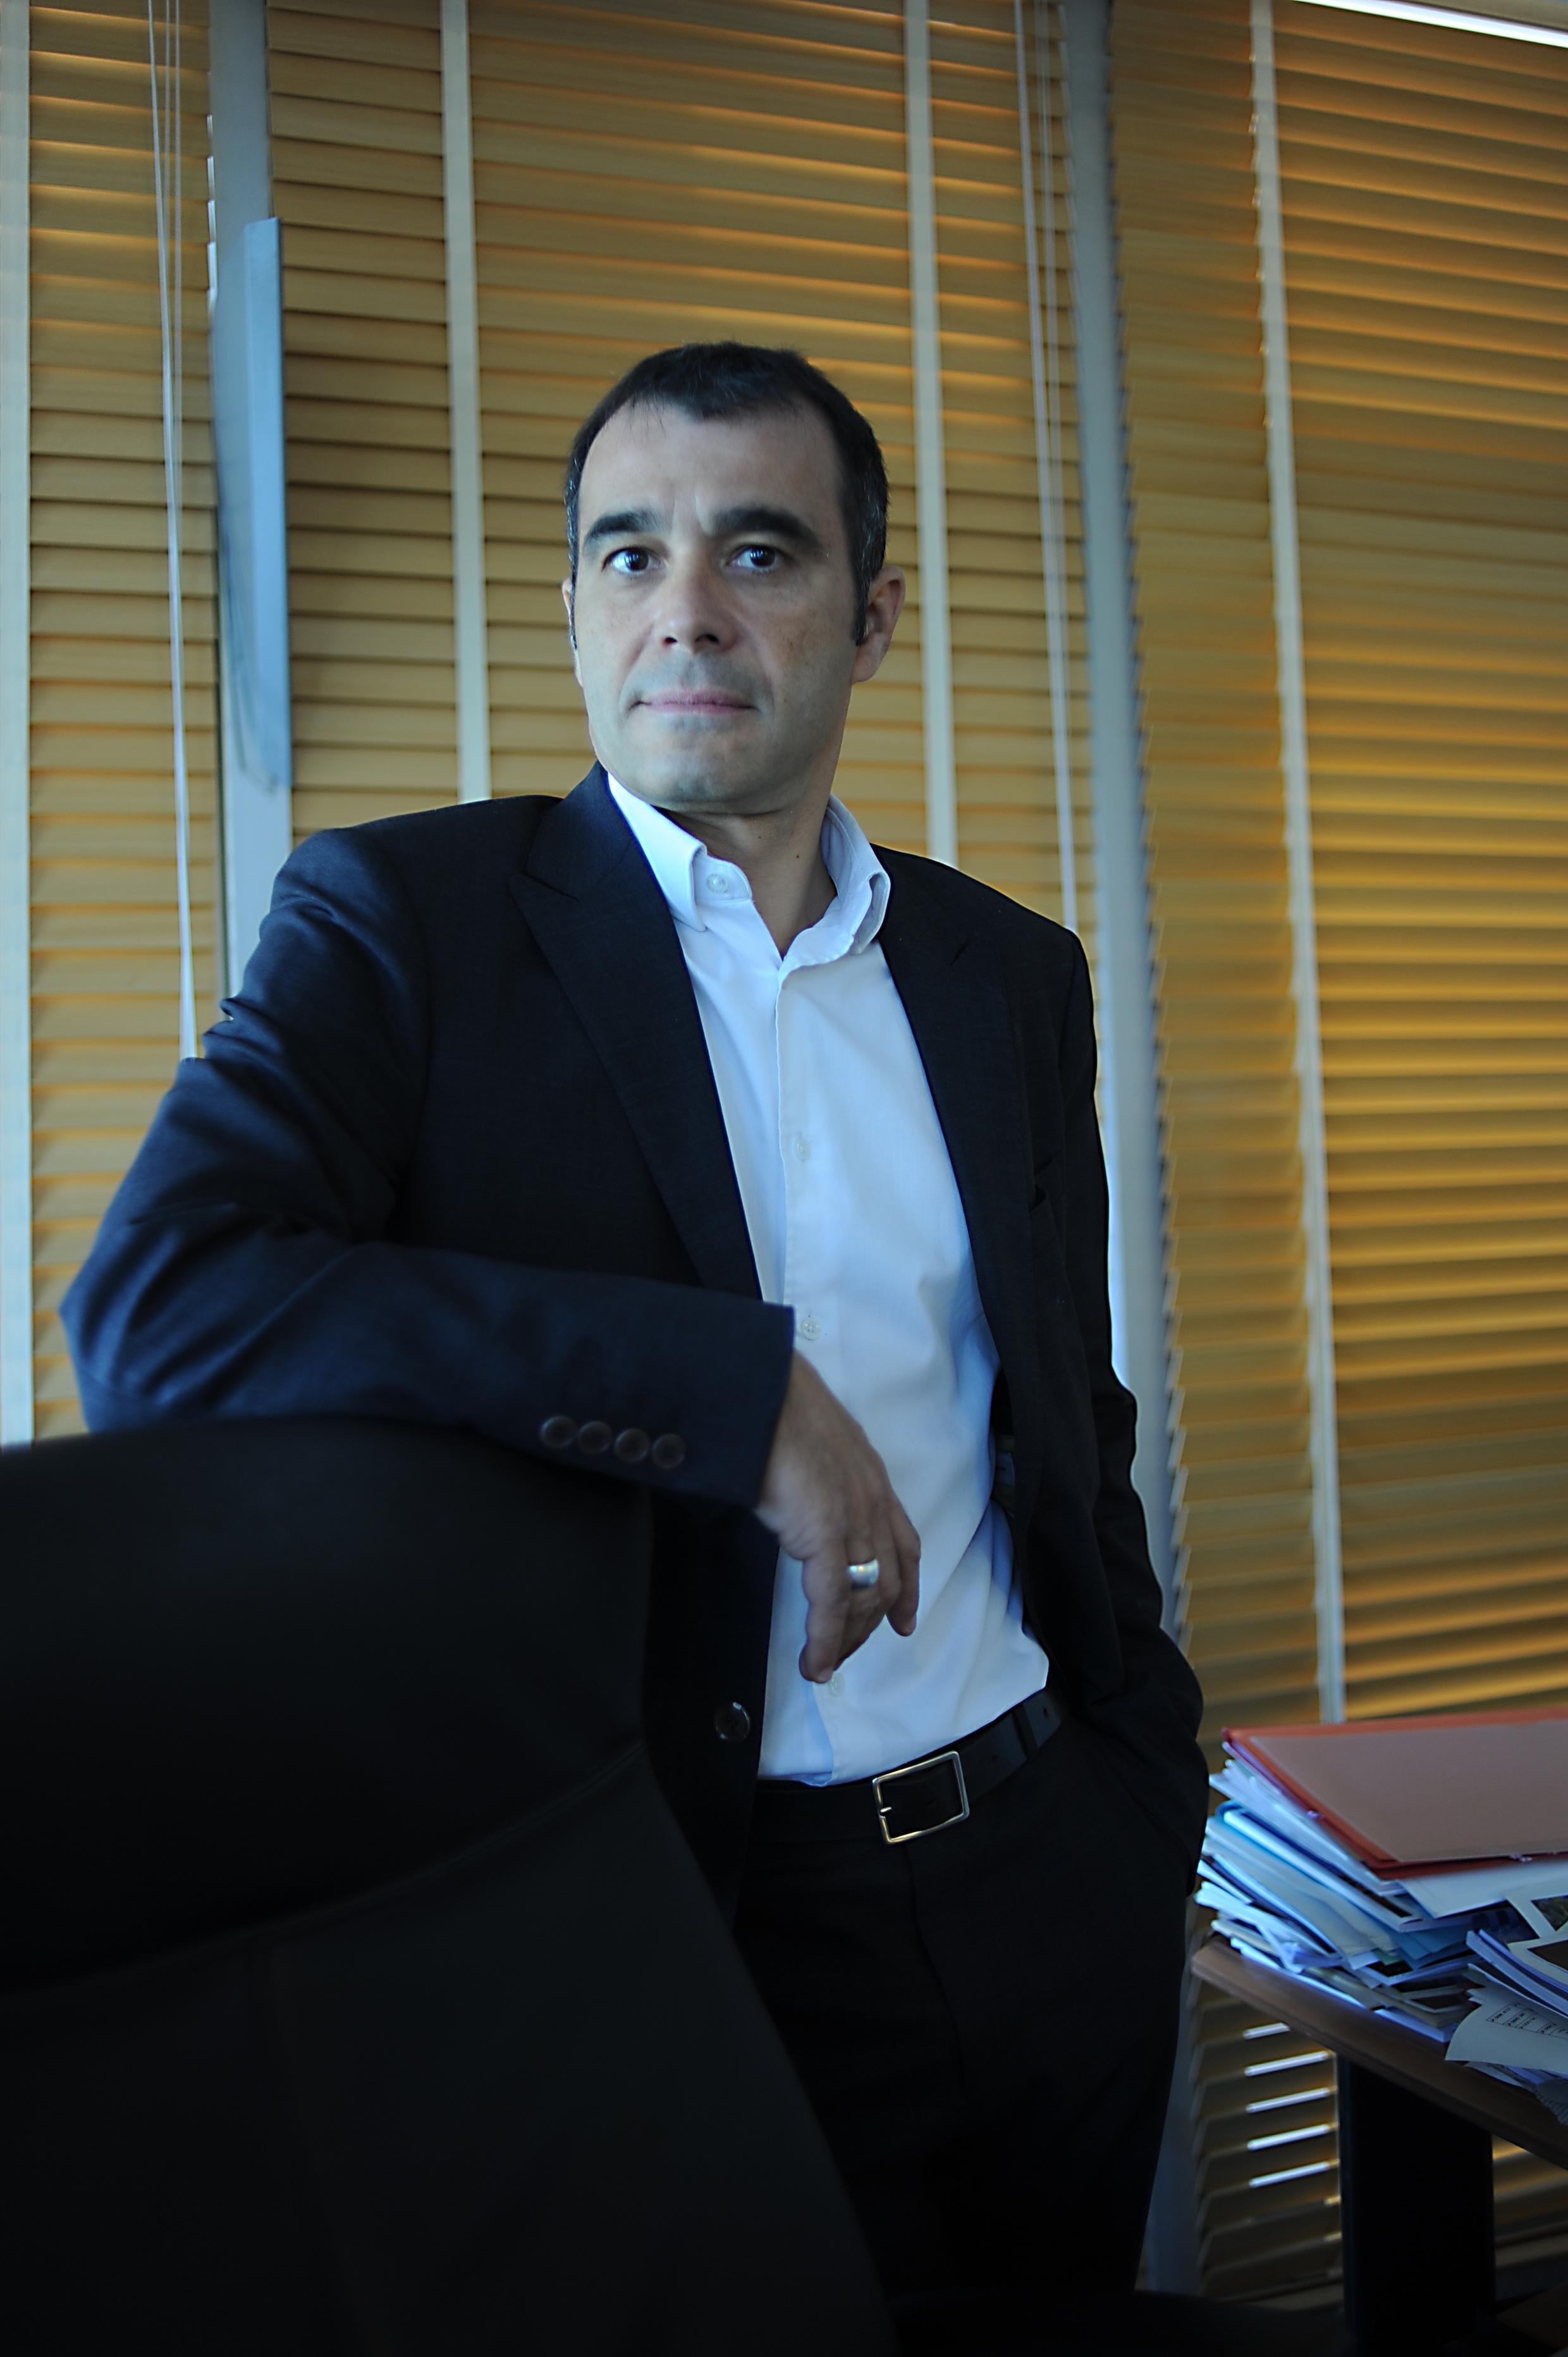 Ricardo Vázquez, el director del Hôtel des Arts de Toulon.